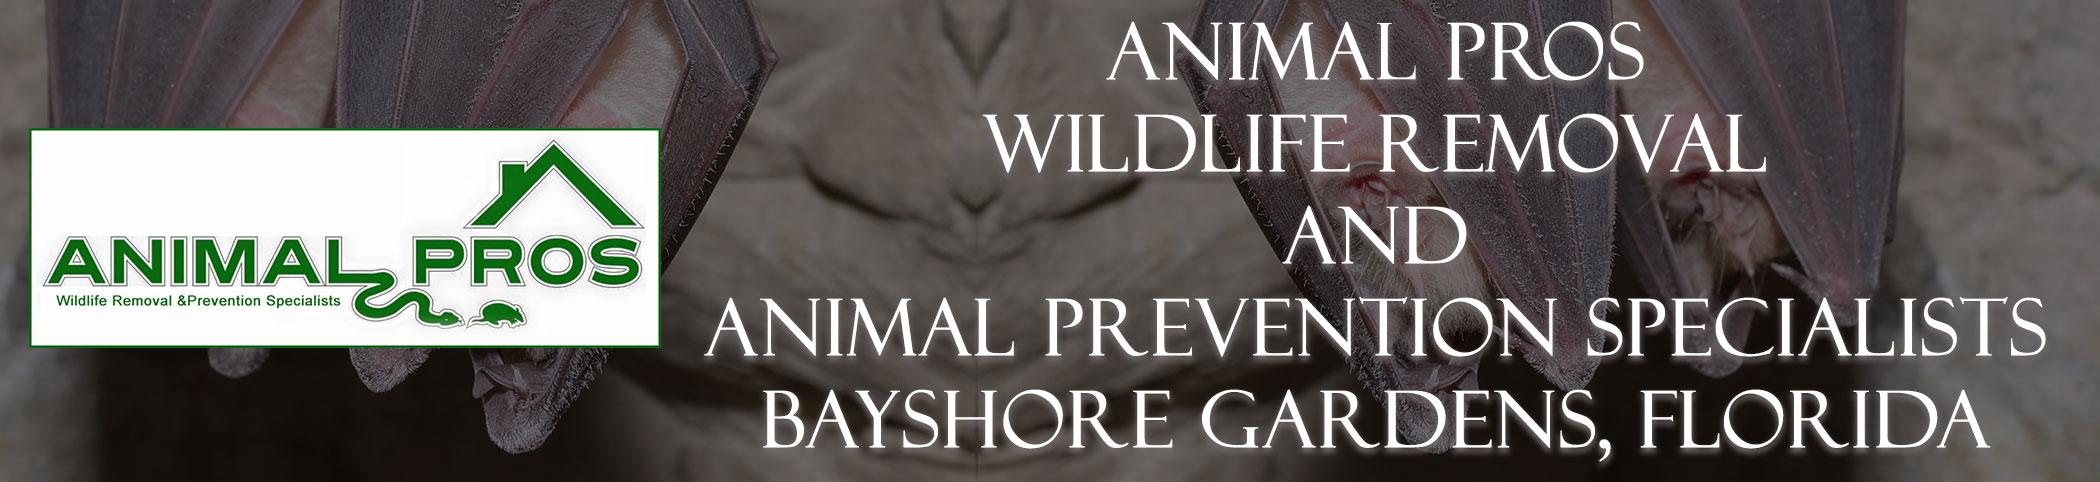 Animal Pros Bayshore Gardens Florida Bat Removal And Wildlife Removal Header Image